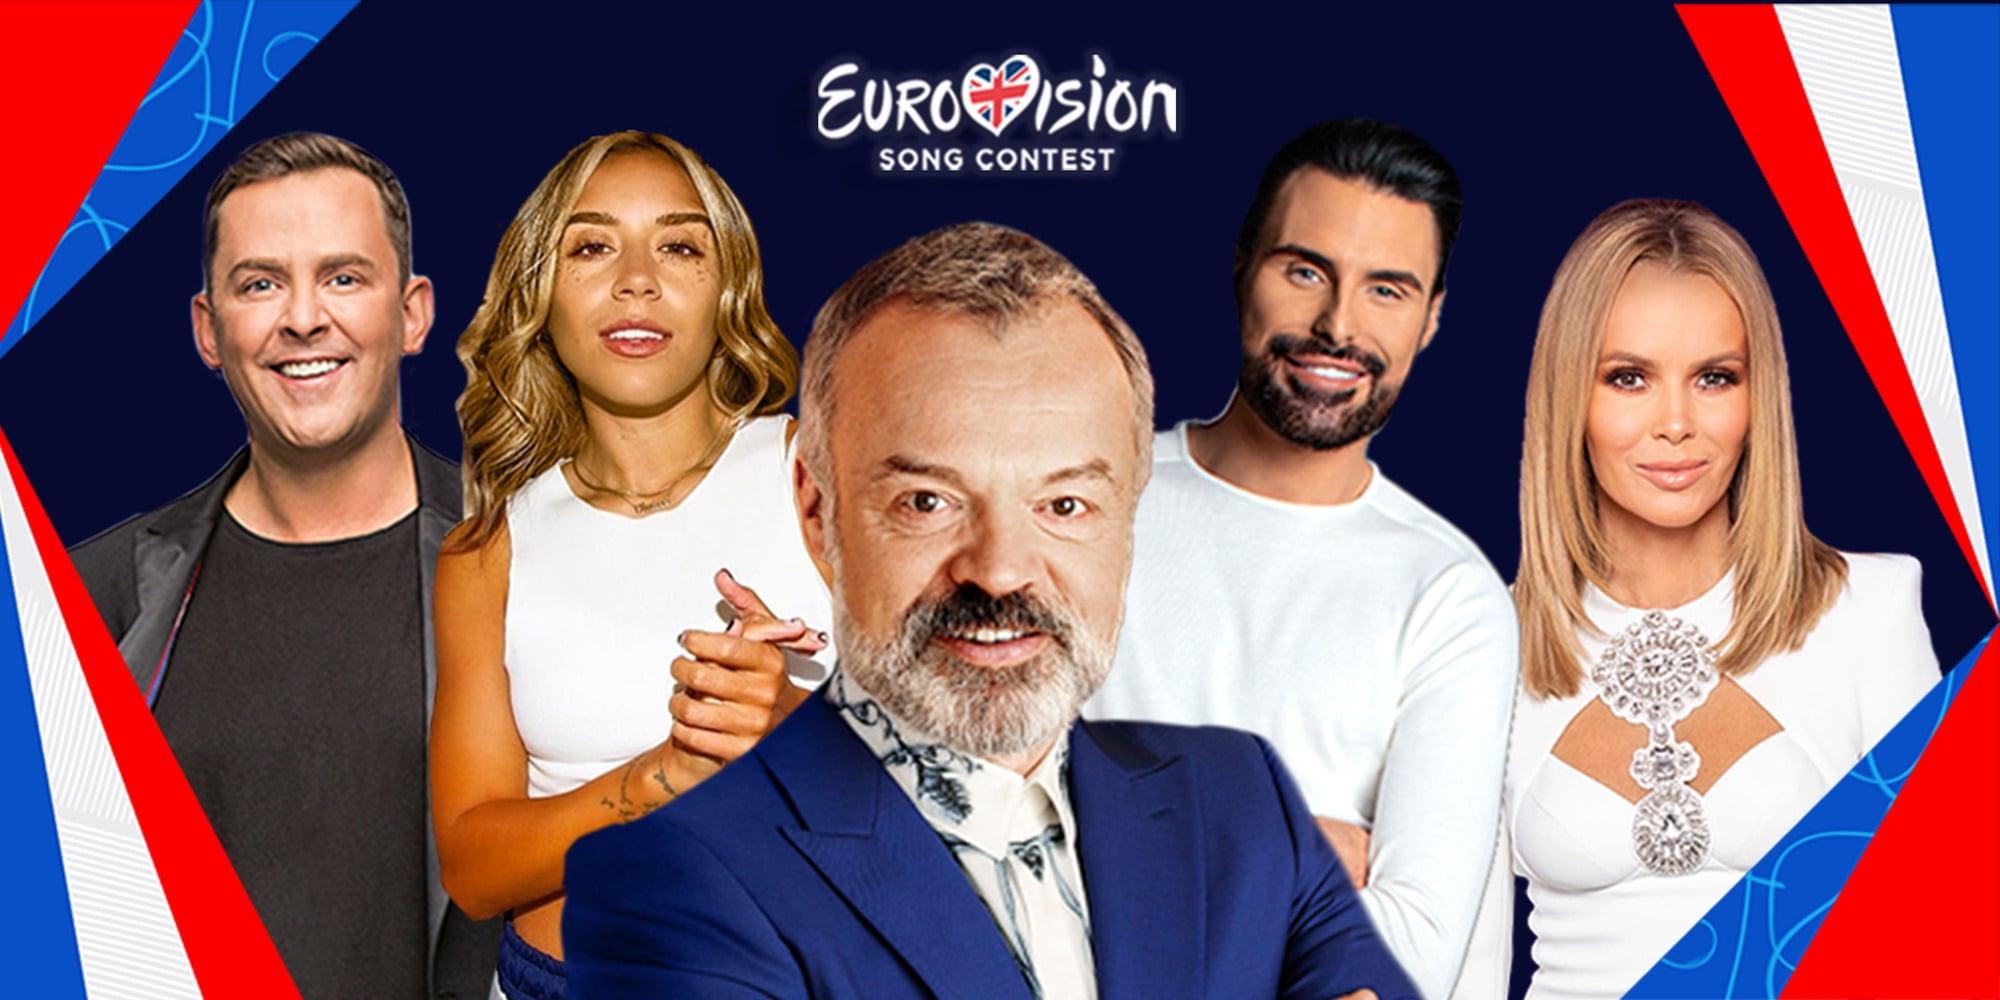 Programme Name: Eurovision 2021 - TX: 22/05/2021 - Episode: Eurovision 2021  (No. n/a) - Picture Shows: (L-R) Scott Mills, Chelcee Grimes, Graham Norton, Rylan Clark-Neal, Amanda Holden - (C) BBC - Photographer: Various